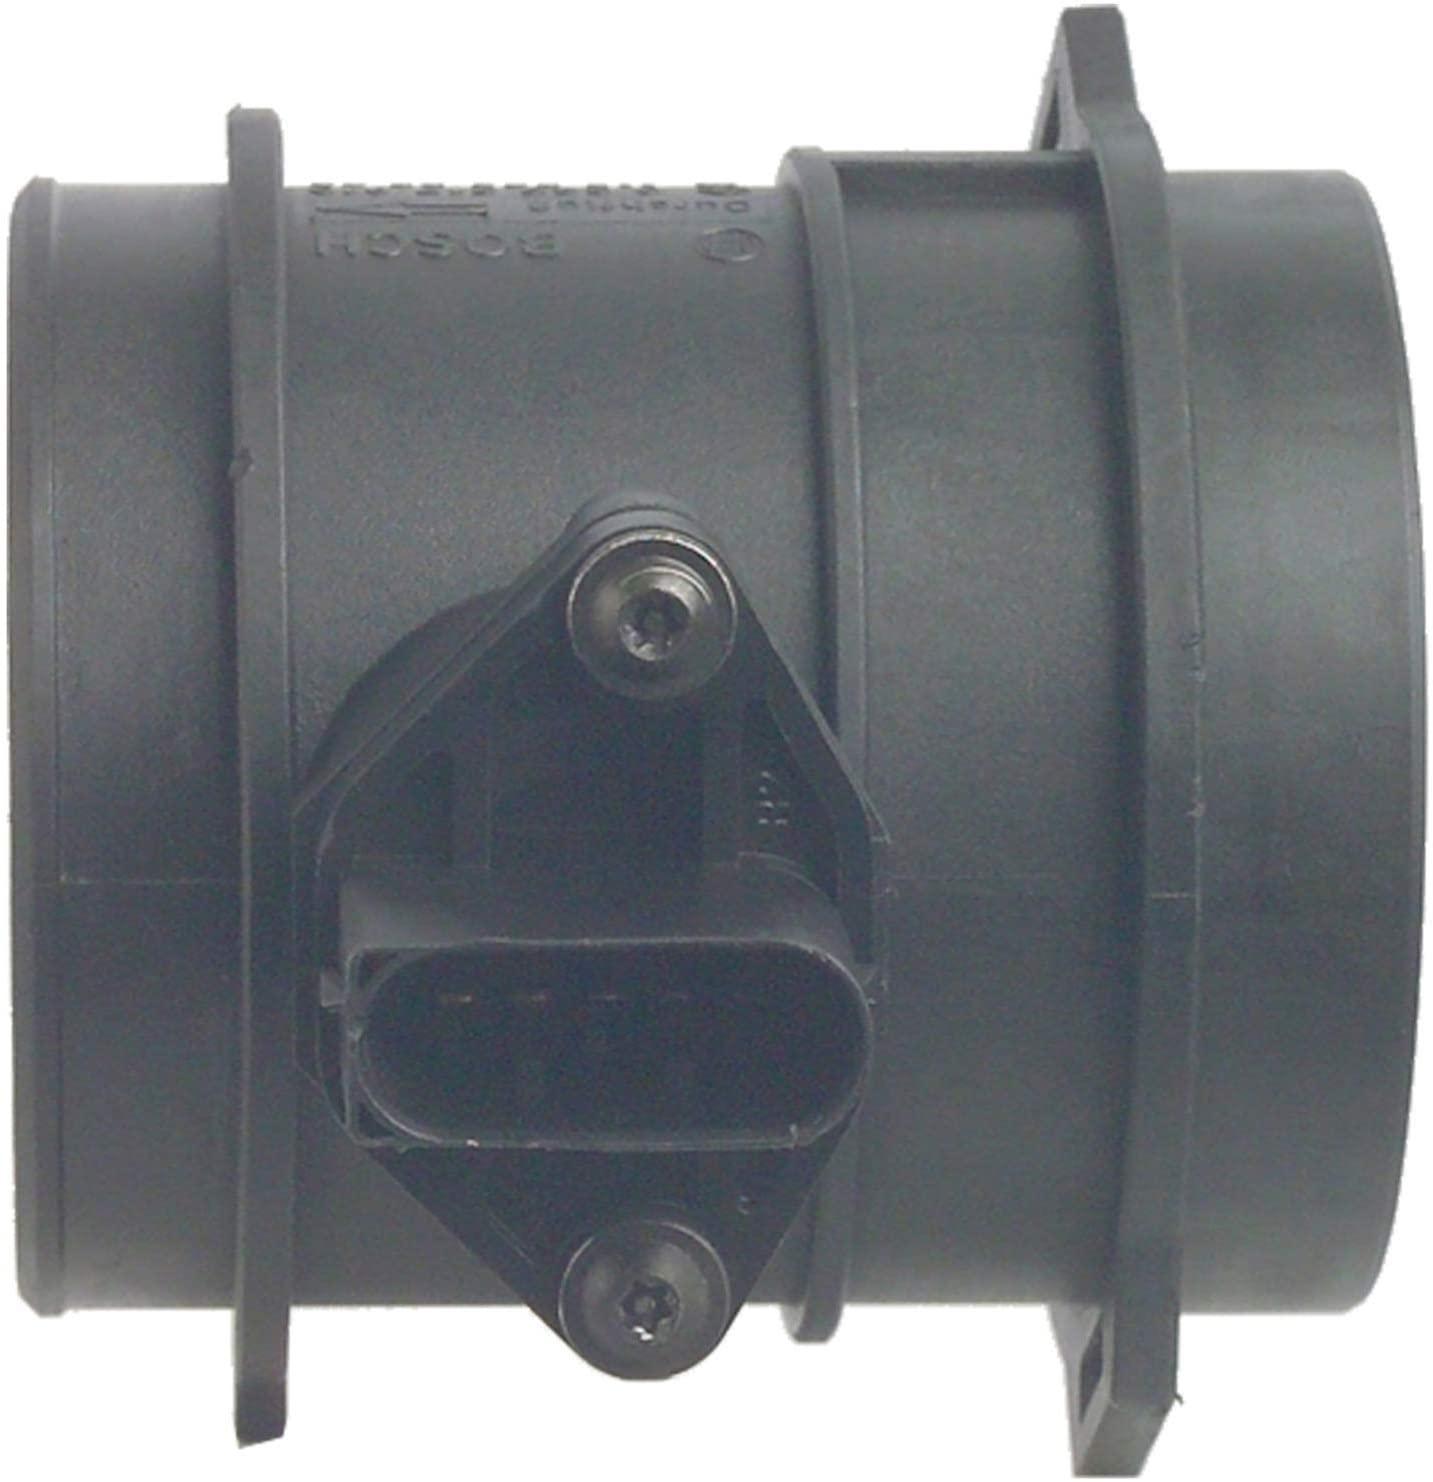 Cardone 74-10104 Remanufactured Mass Airflow Sensor (MAFS)